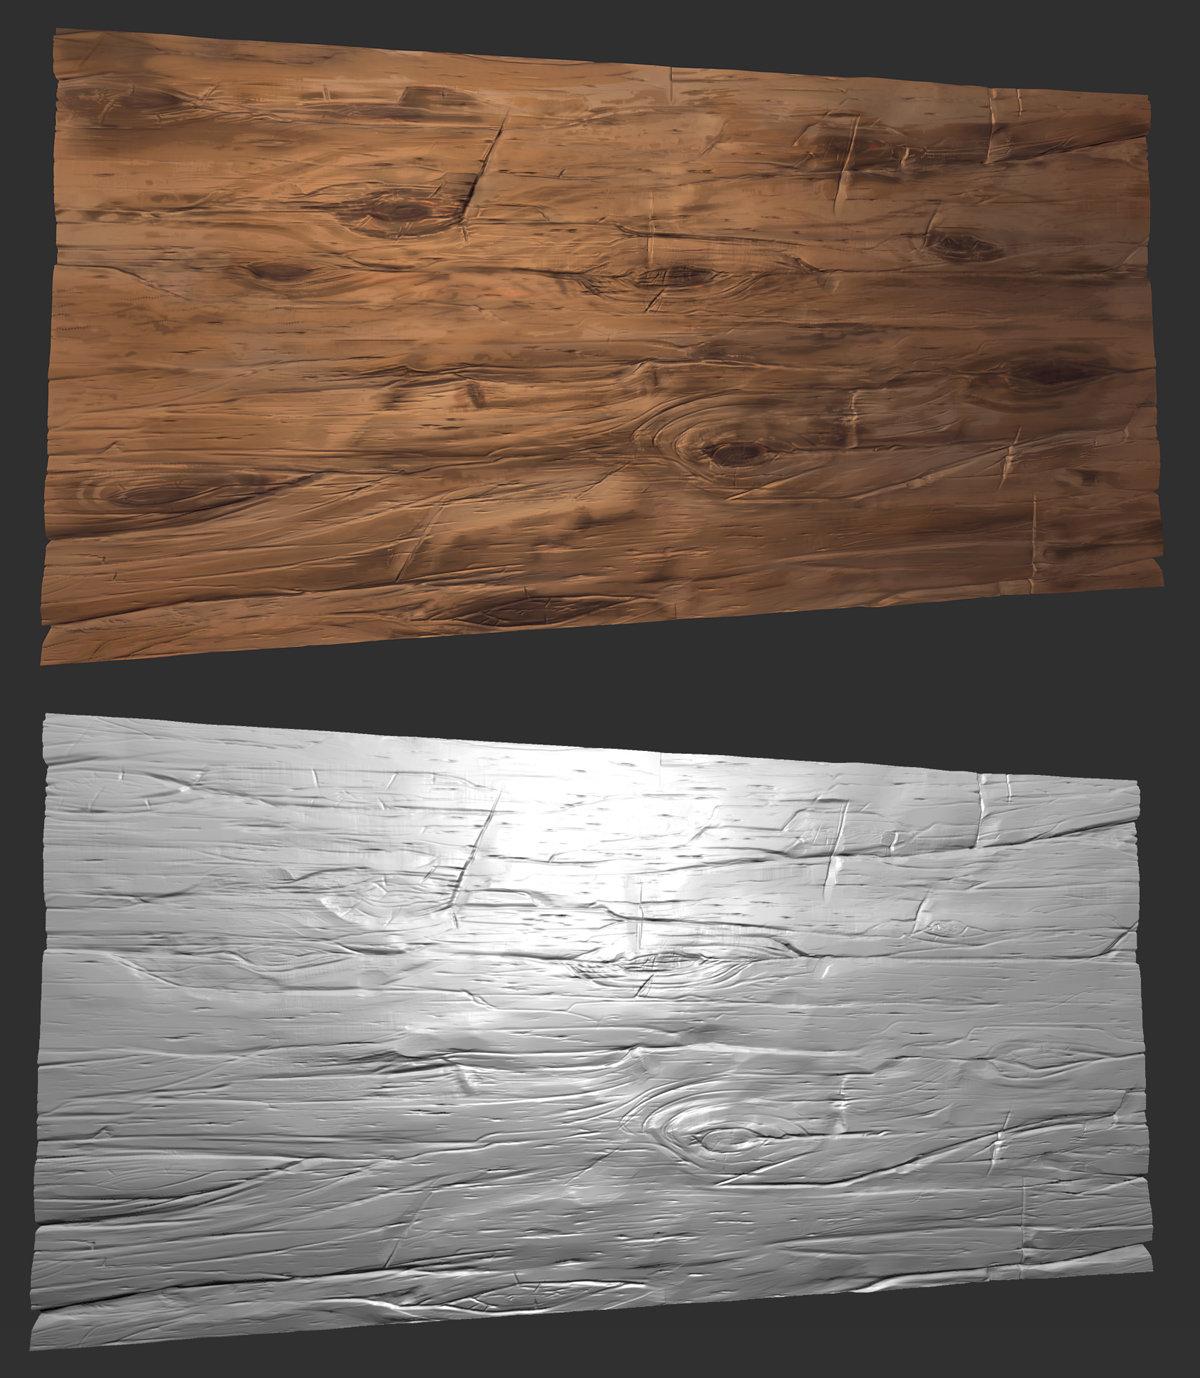 ArtStation - Stylized wood sculpt tiled texture - Zbrush